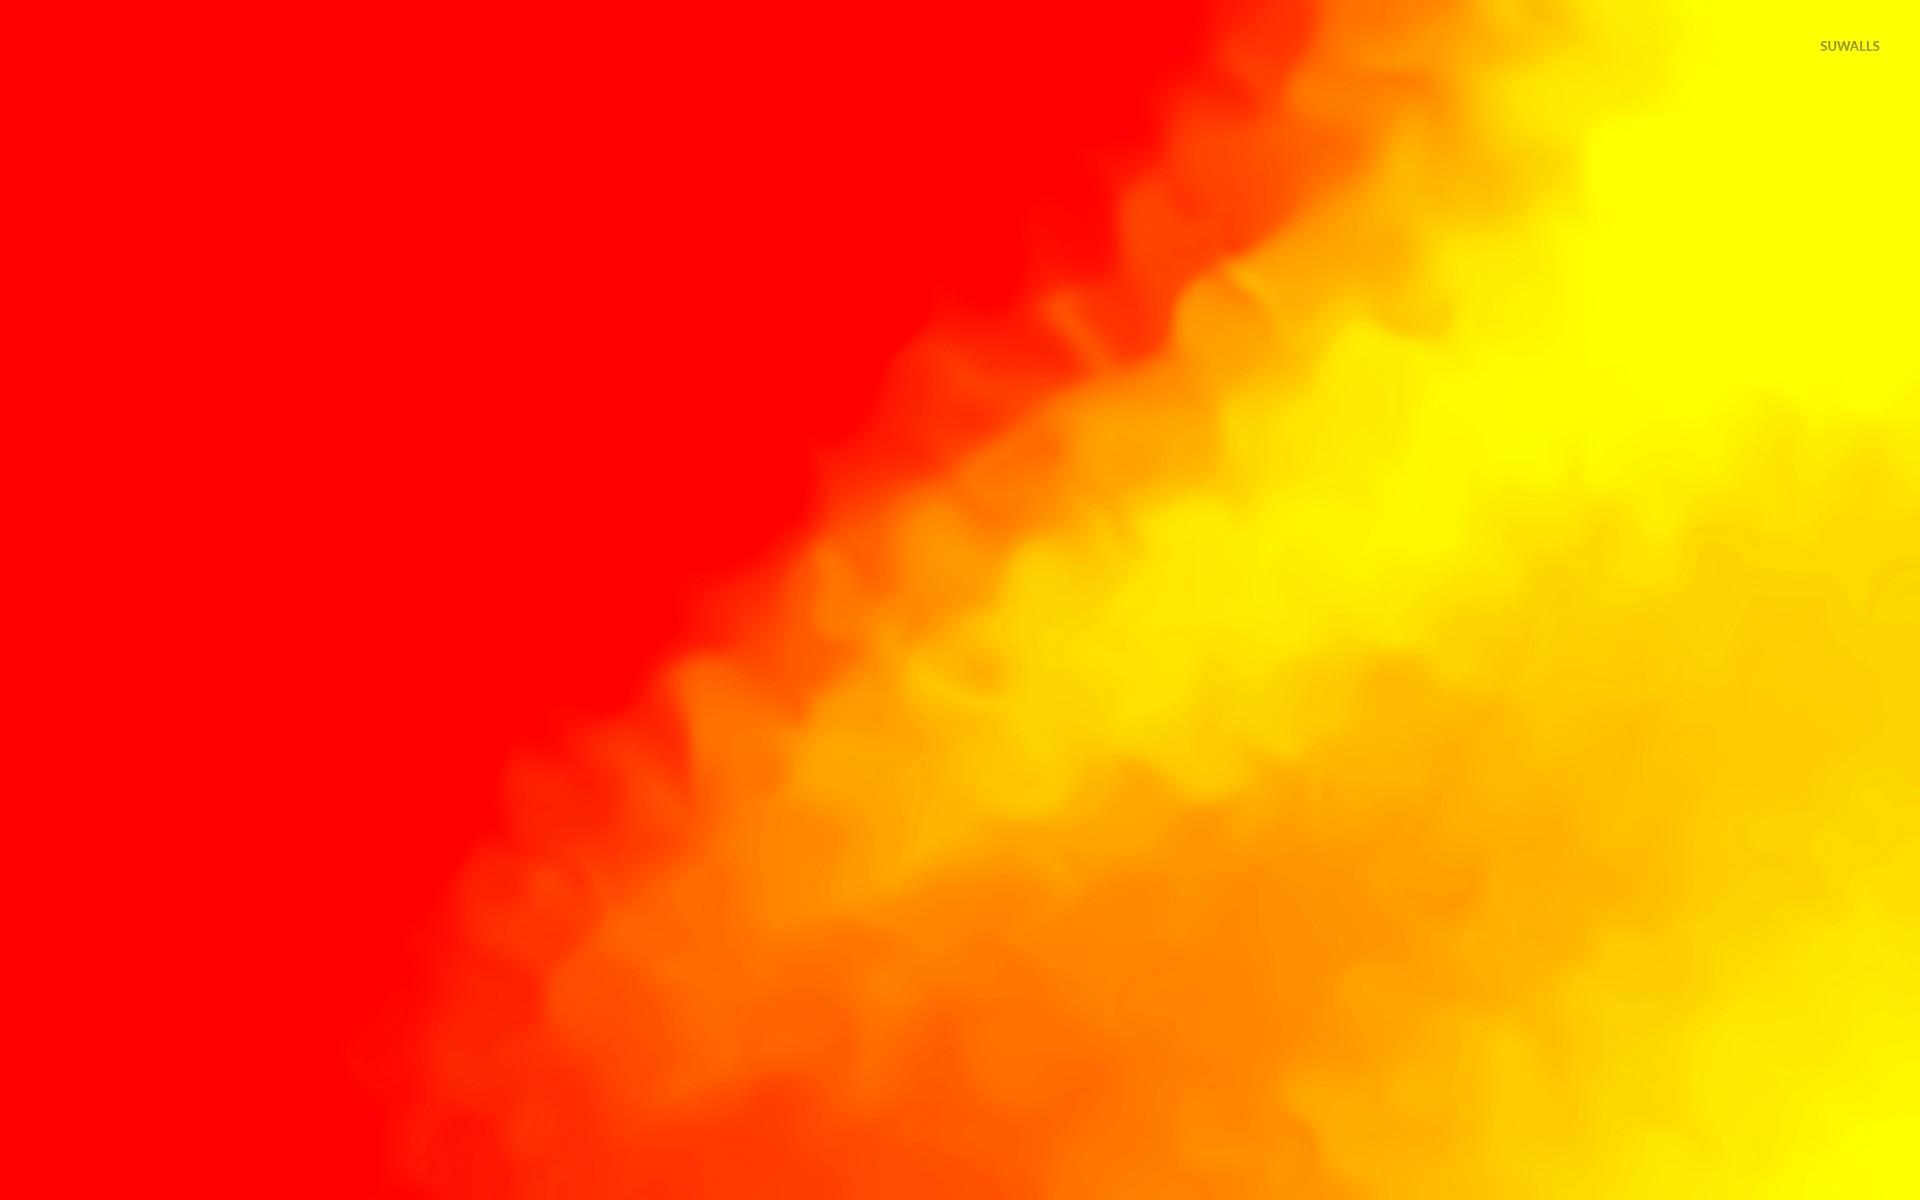 Orange gradient [2] wallpaper jpg